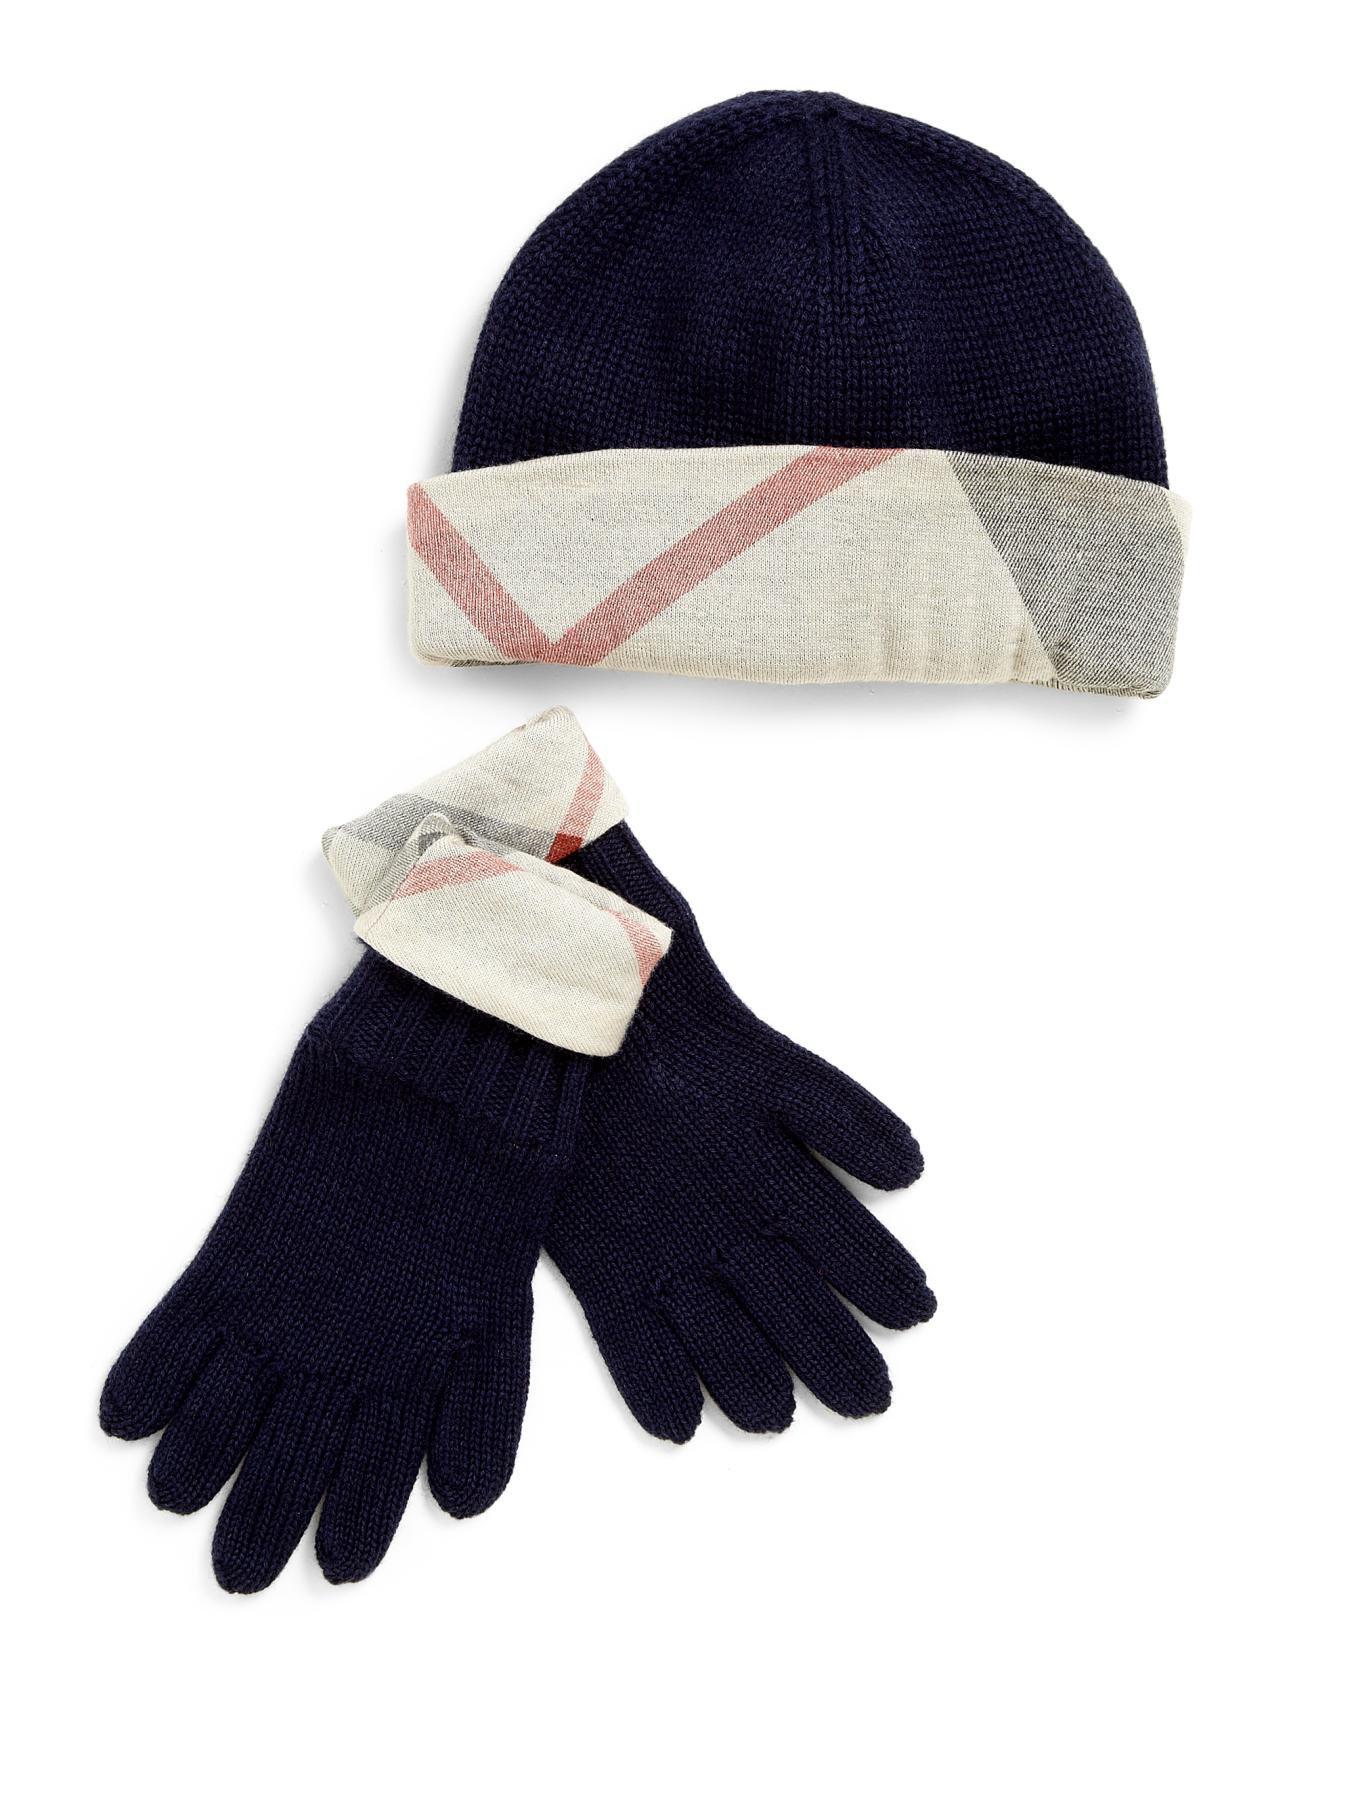 ... order burberry hat and scarf hd image ukjugs 432dd 7b95e 69f46ceede8